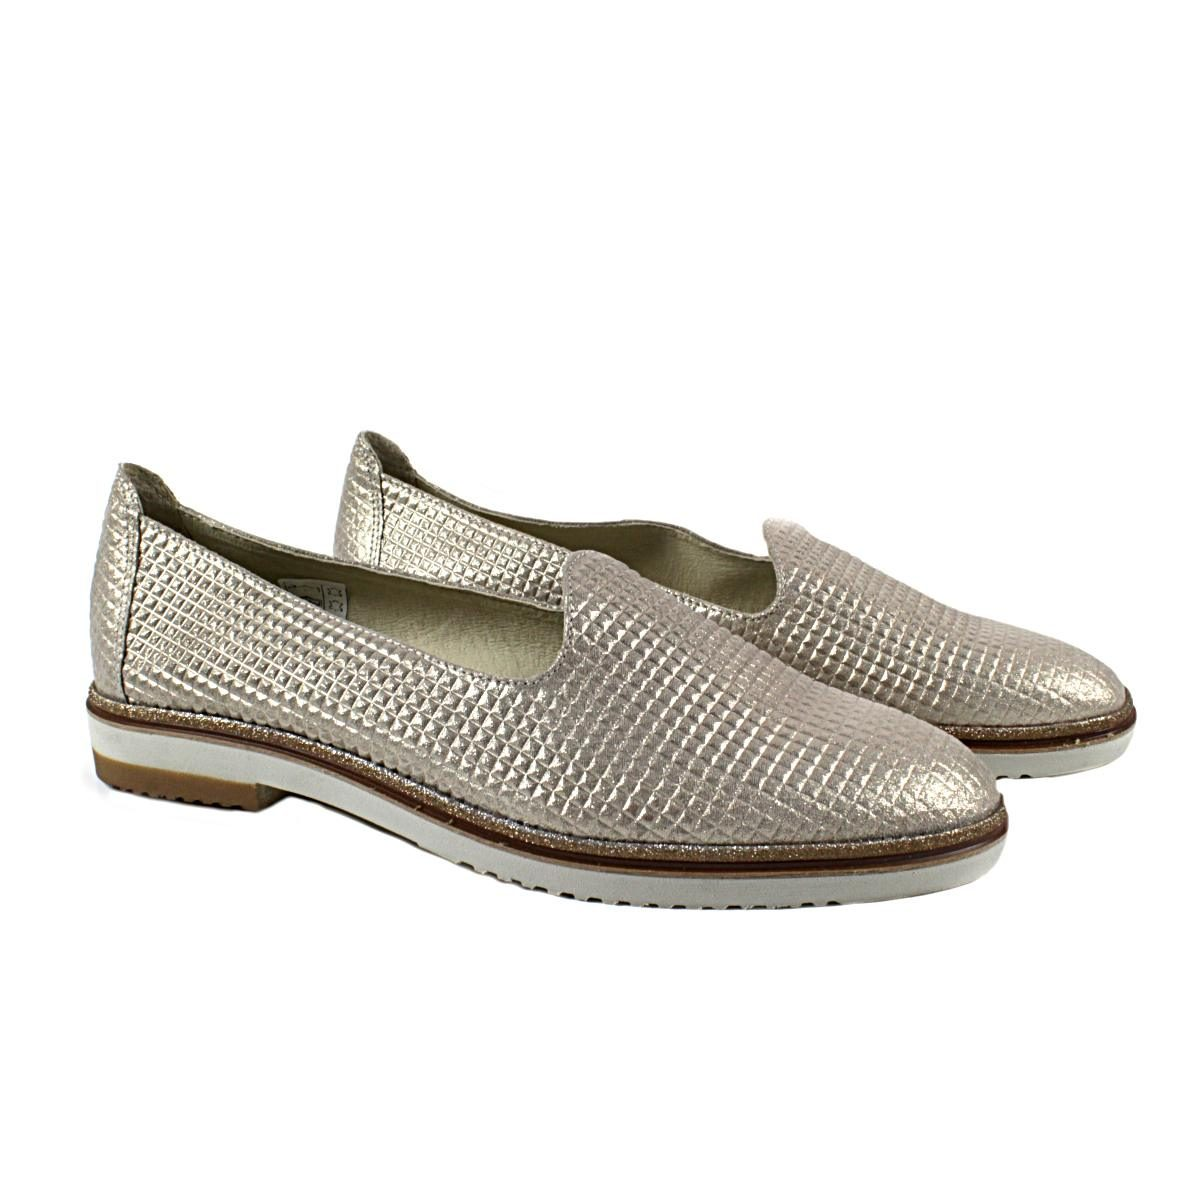 Златисти Дамски Обувки Естествена Кожа с Щампа Двете